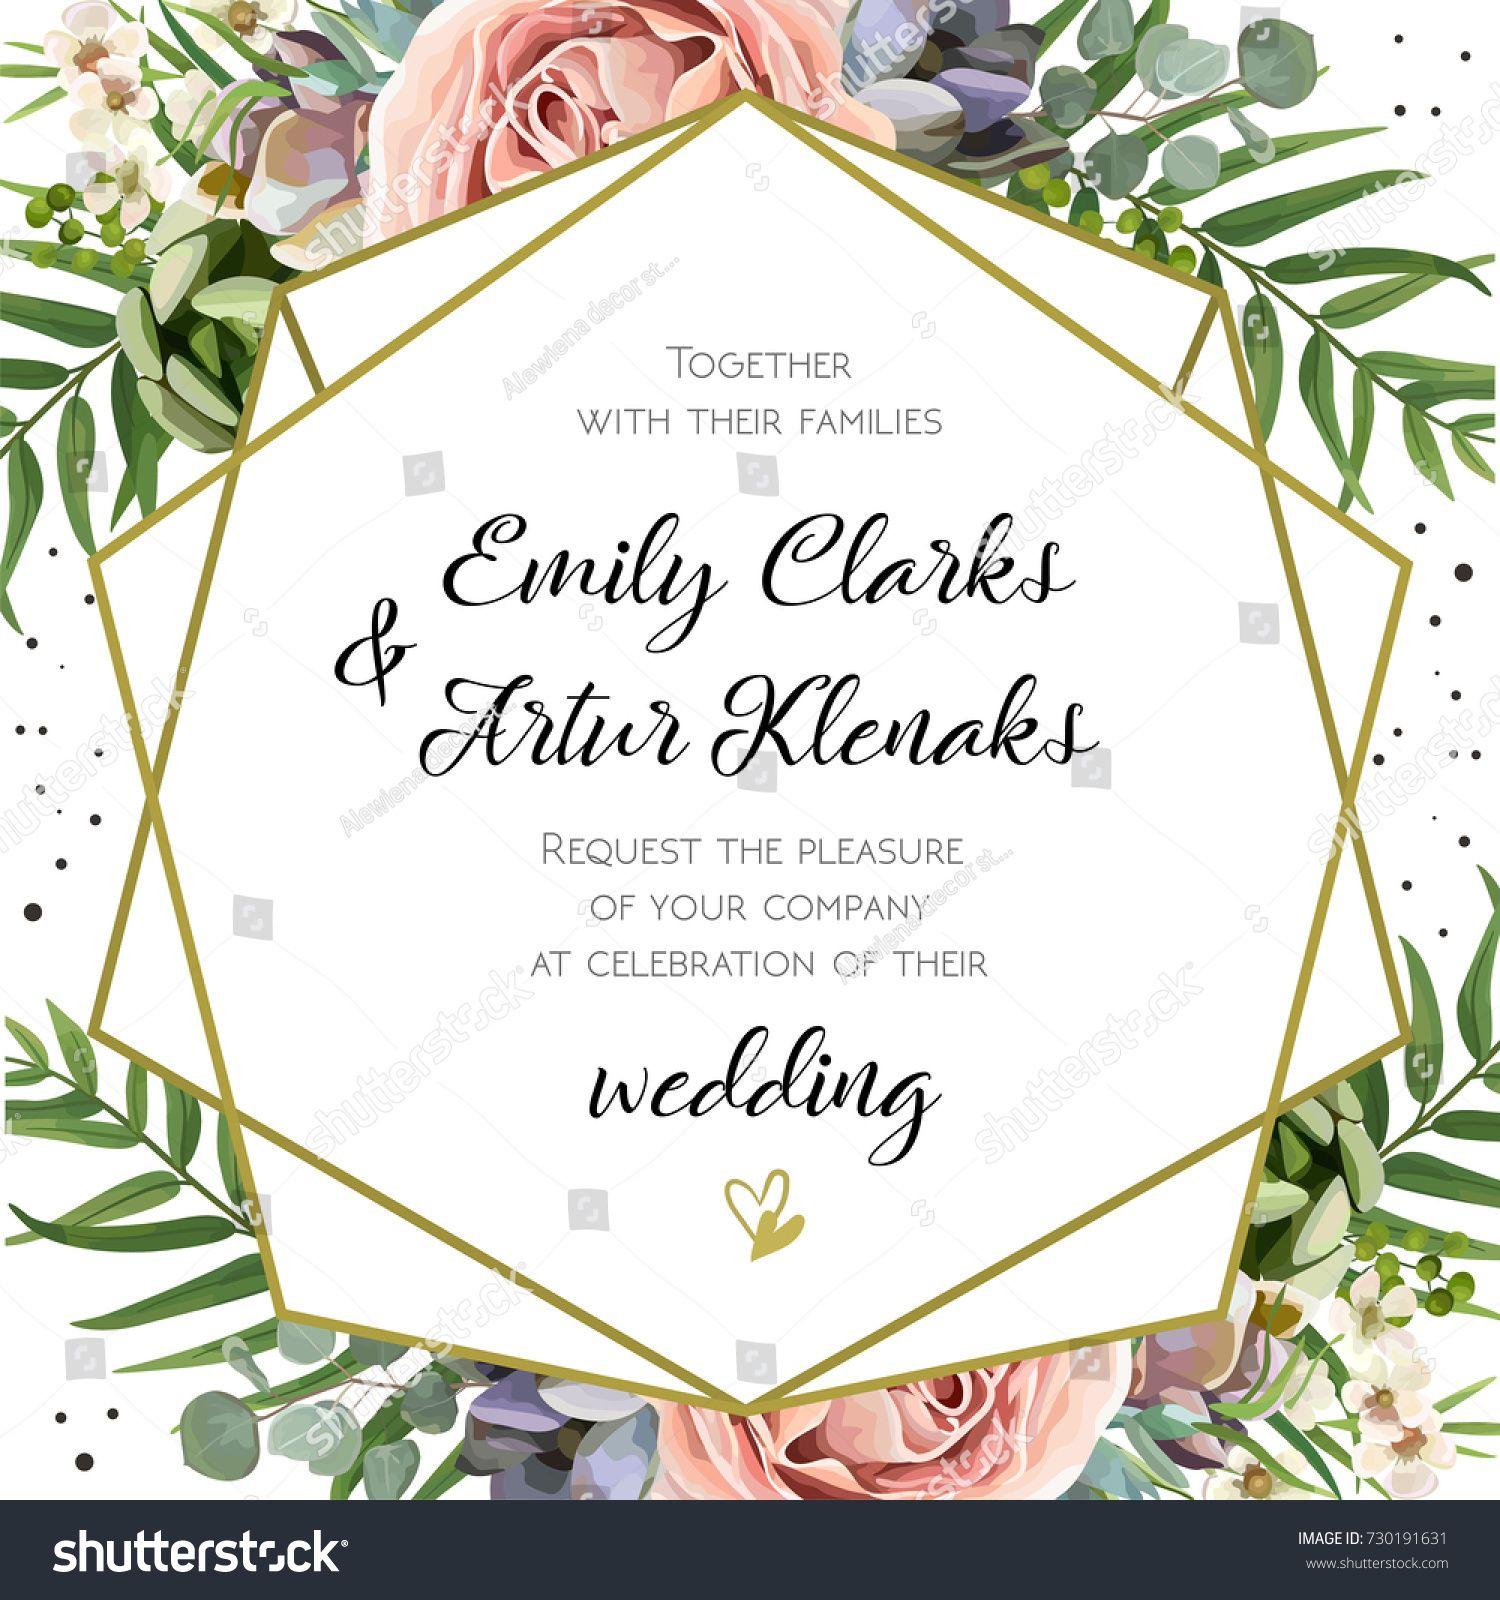 Flowers Vector Design Wedding Invitations Wedding: Wedding Invitation, Floral Invite Card Design: Peach